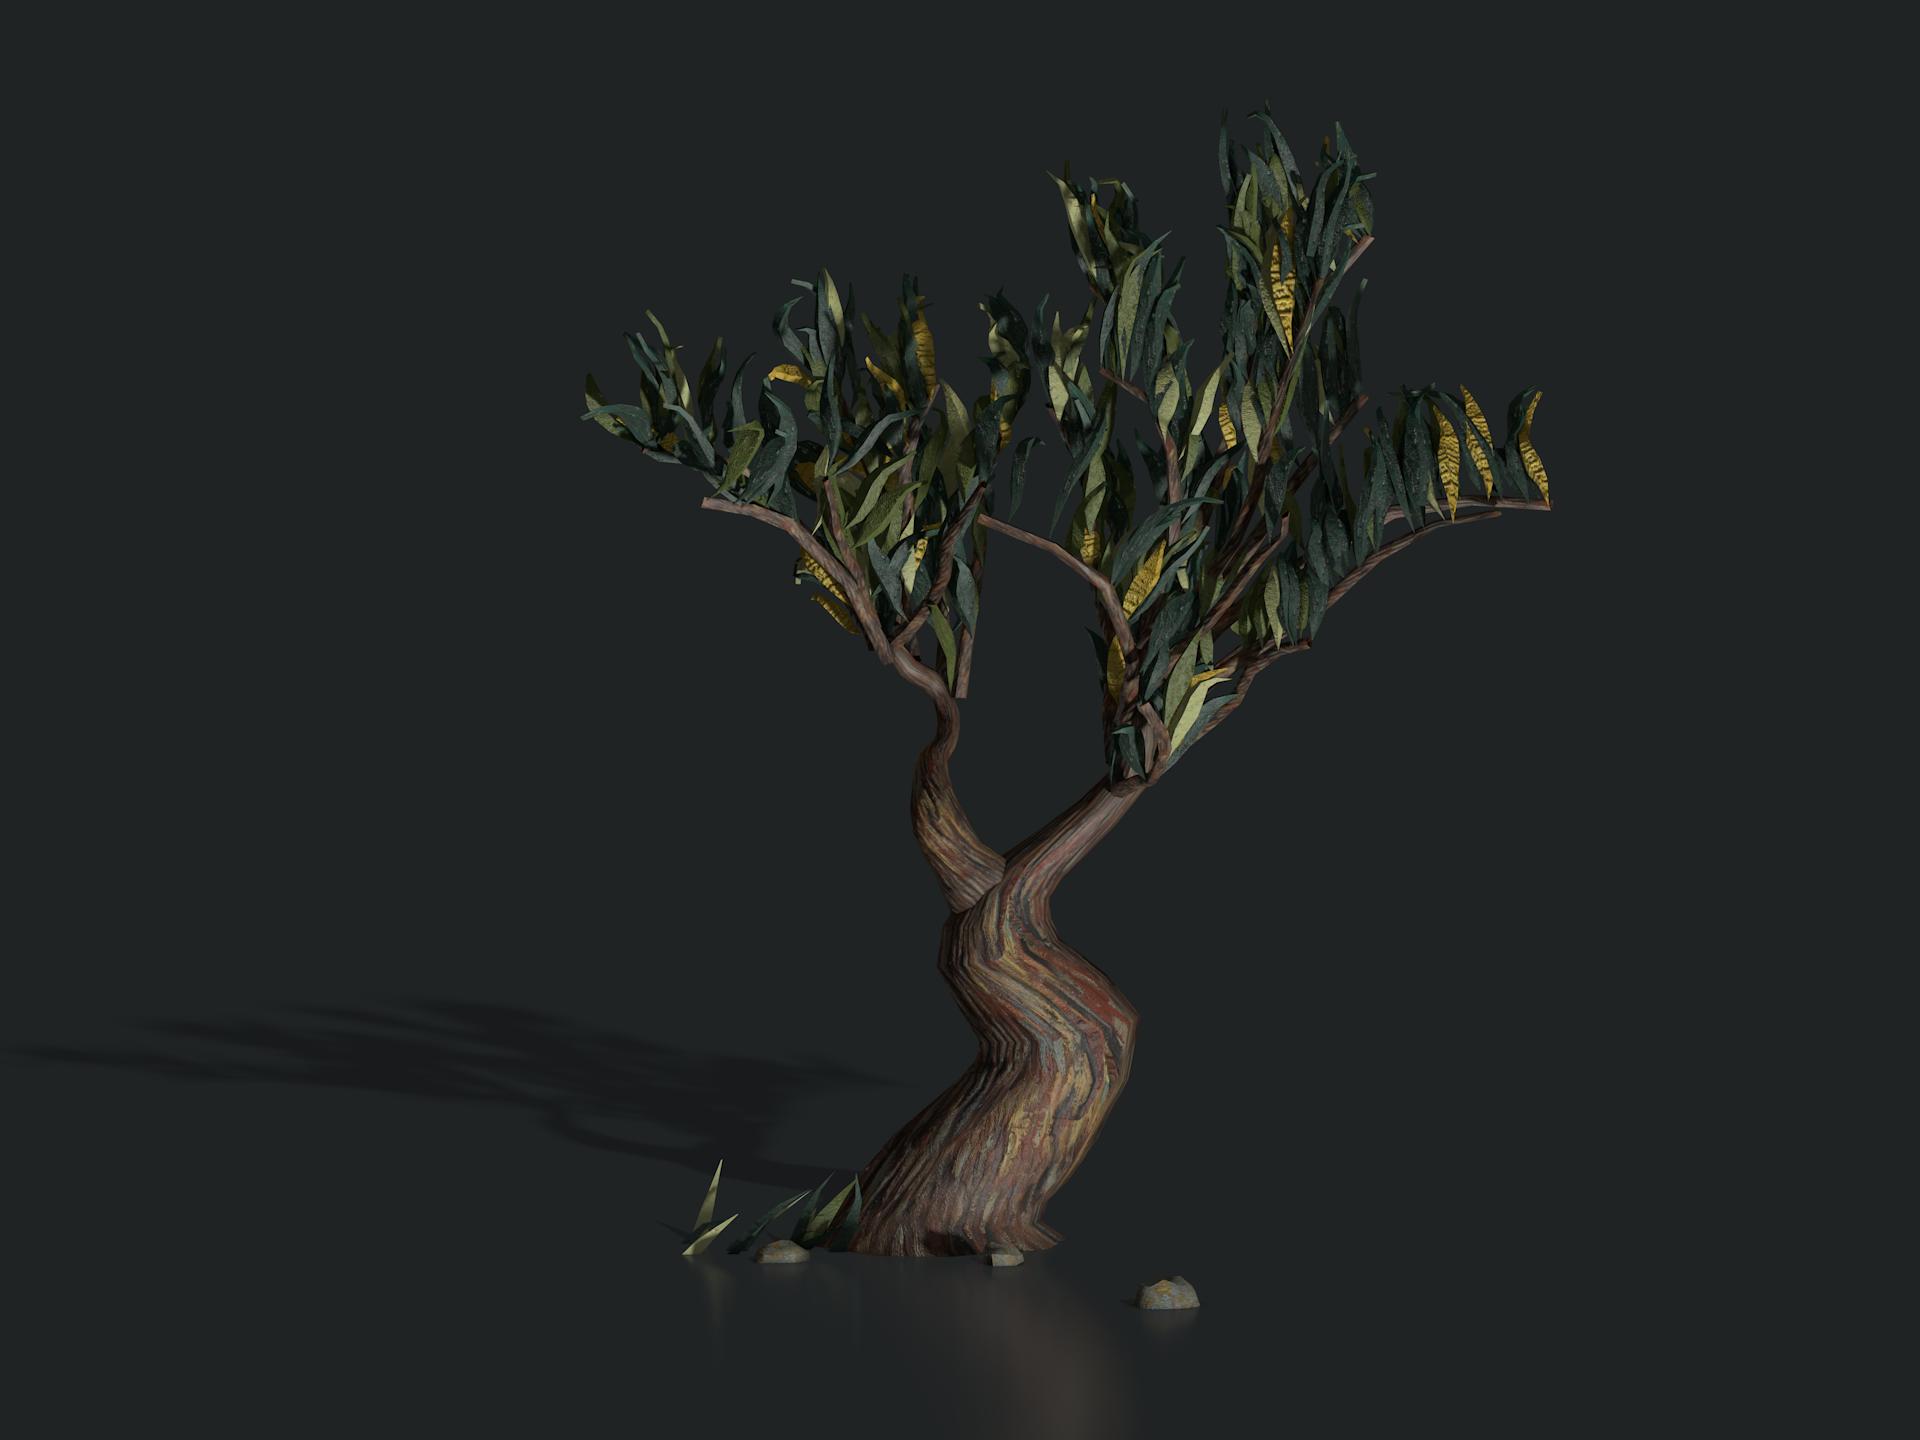 plants_saint_remy_tree1306.png